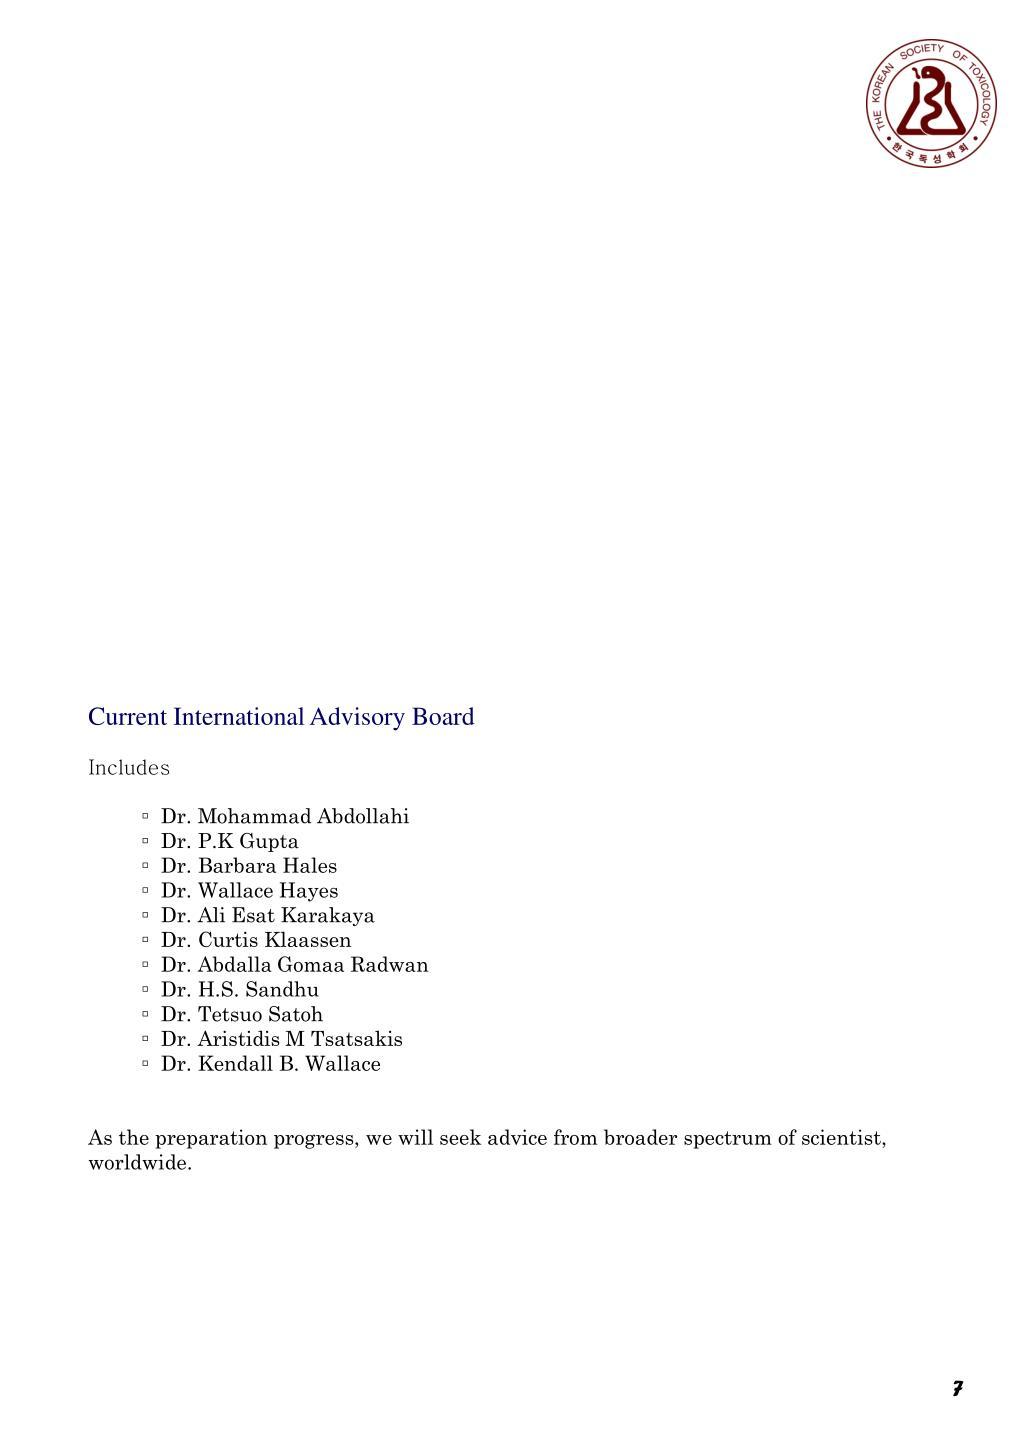 Current International Advisory Board